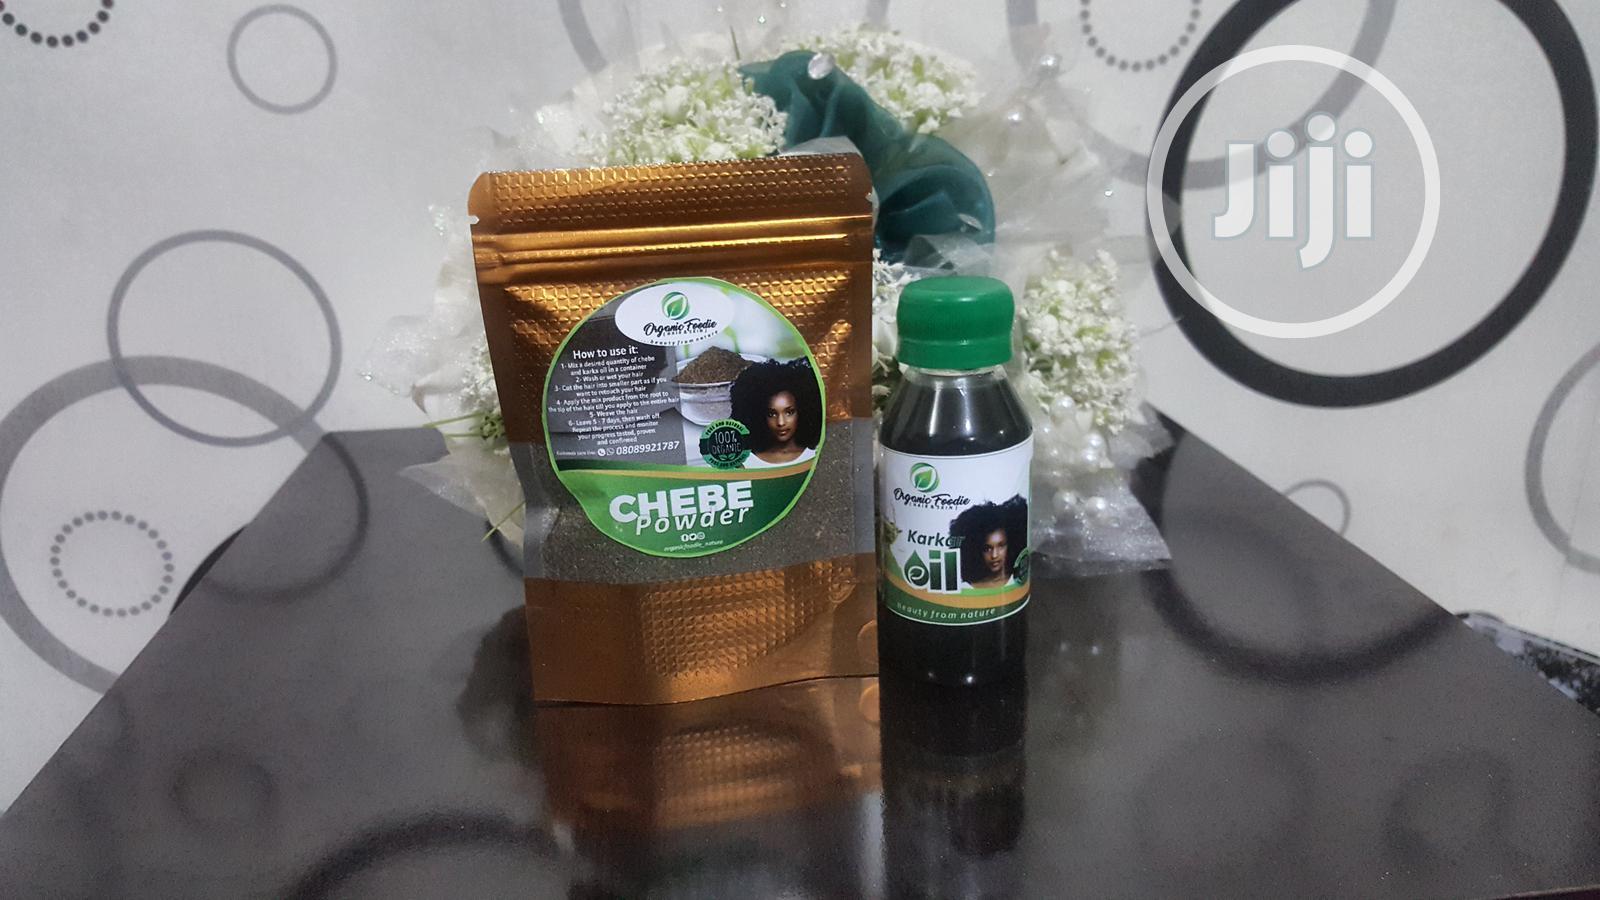 Organic Foodie Chebe Powder And Karkar Oil